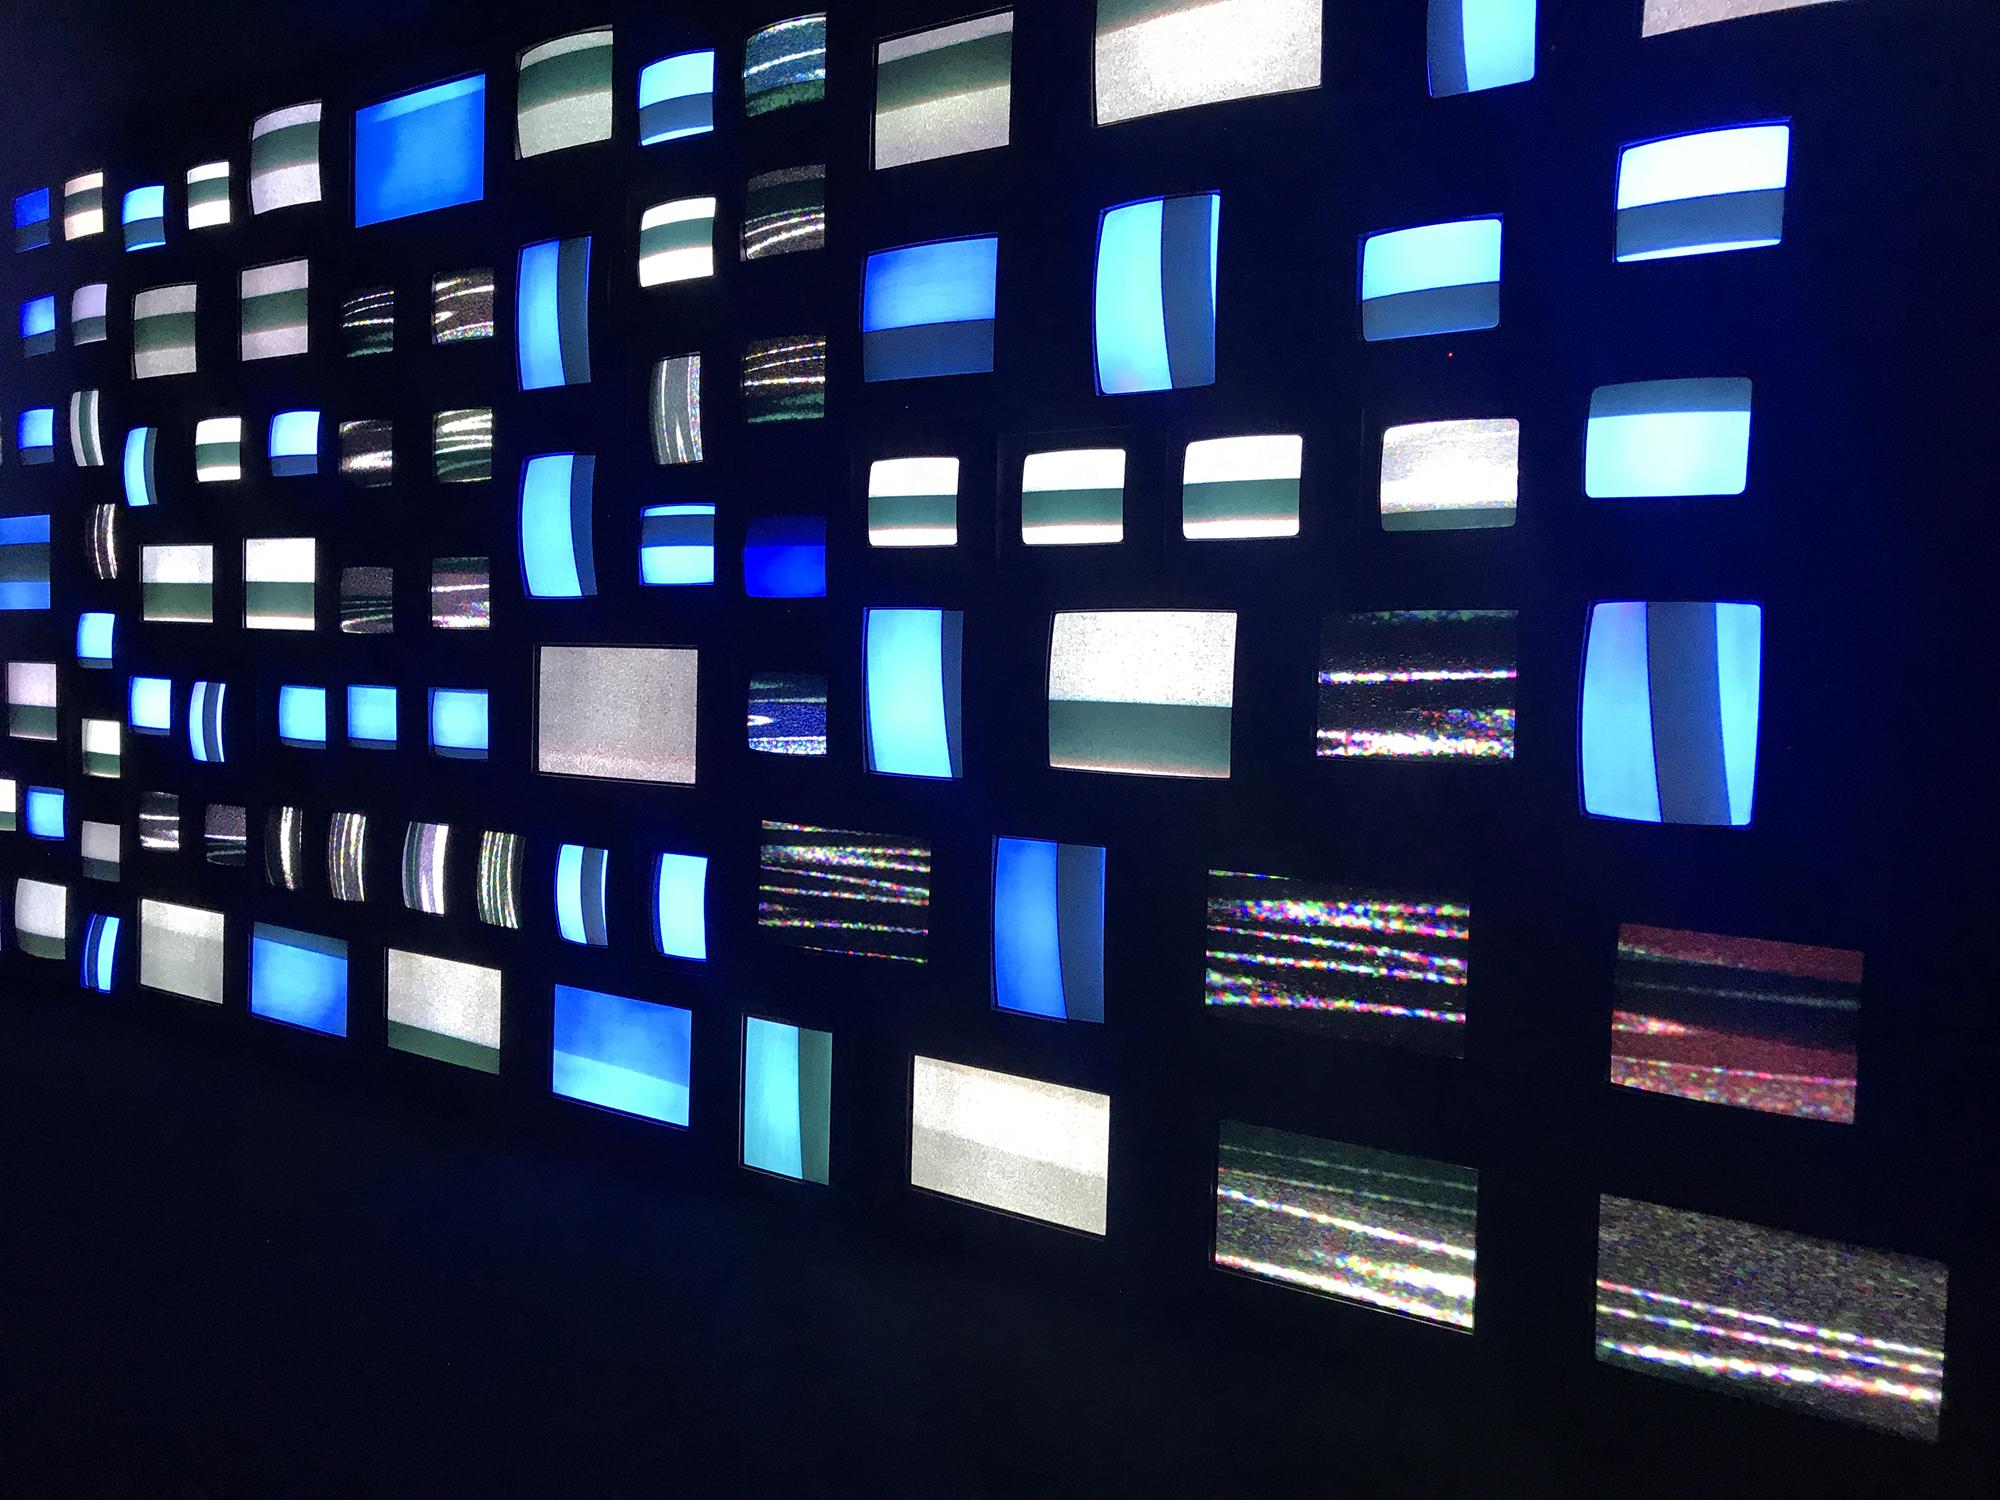 Susan Hiller: Channels, 2013